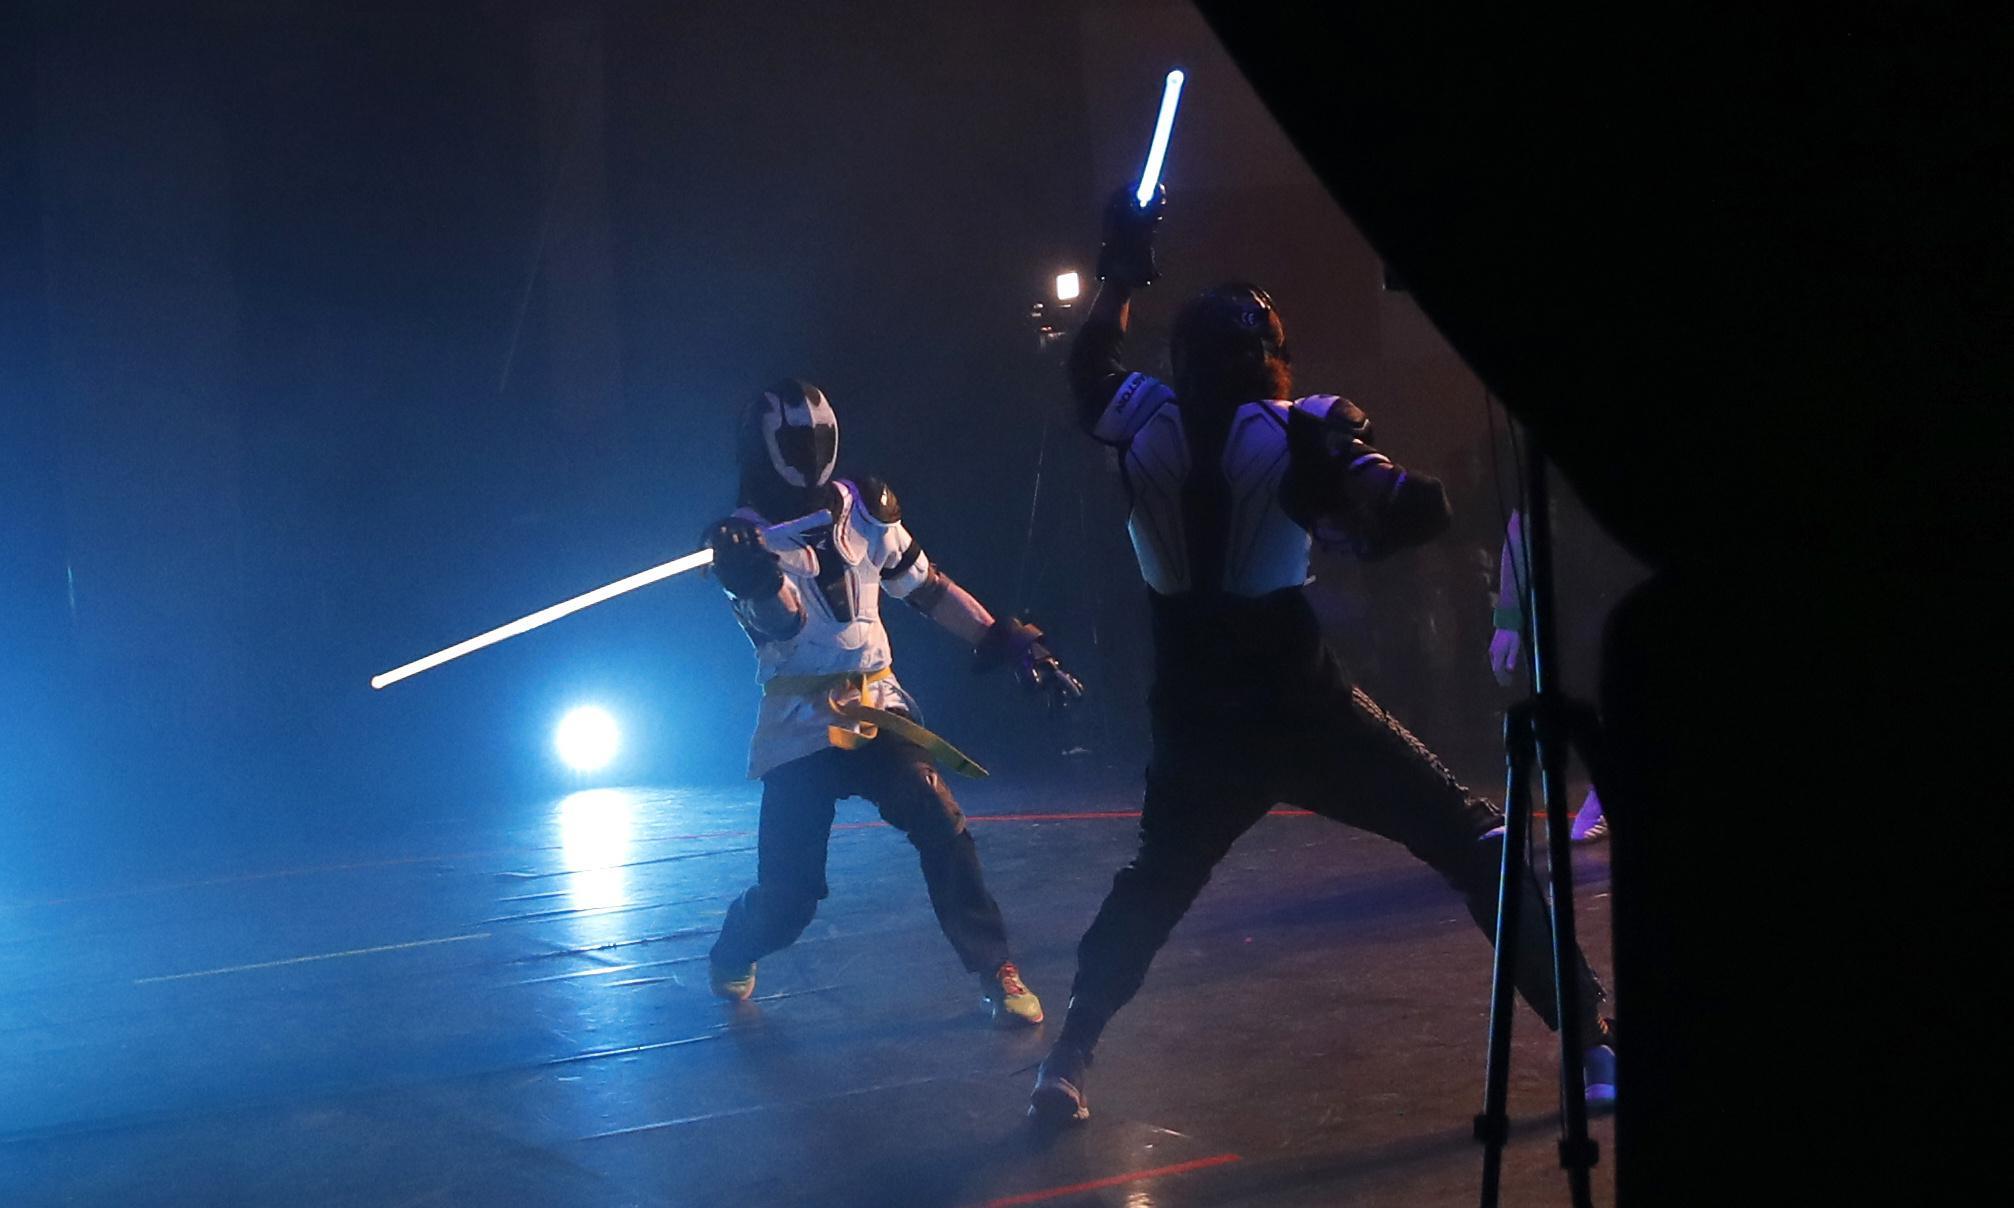 Lightsaber duelling registered as official sport in France